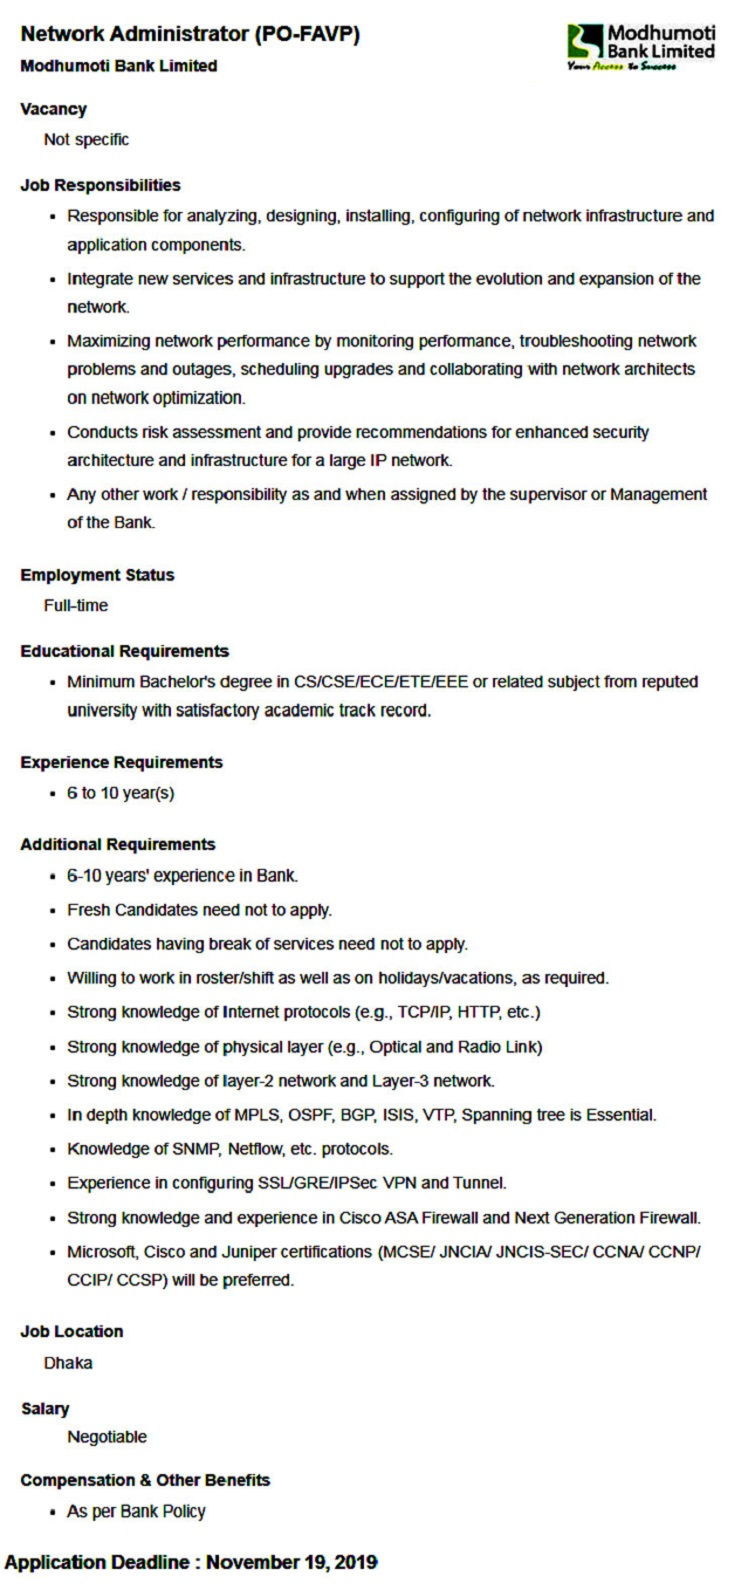 Modhumoti Bank Limited Job Circular 2019